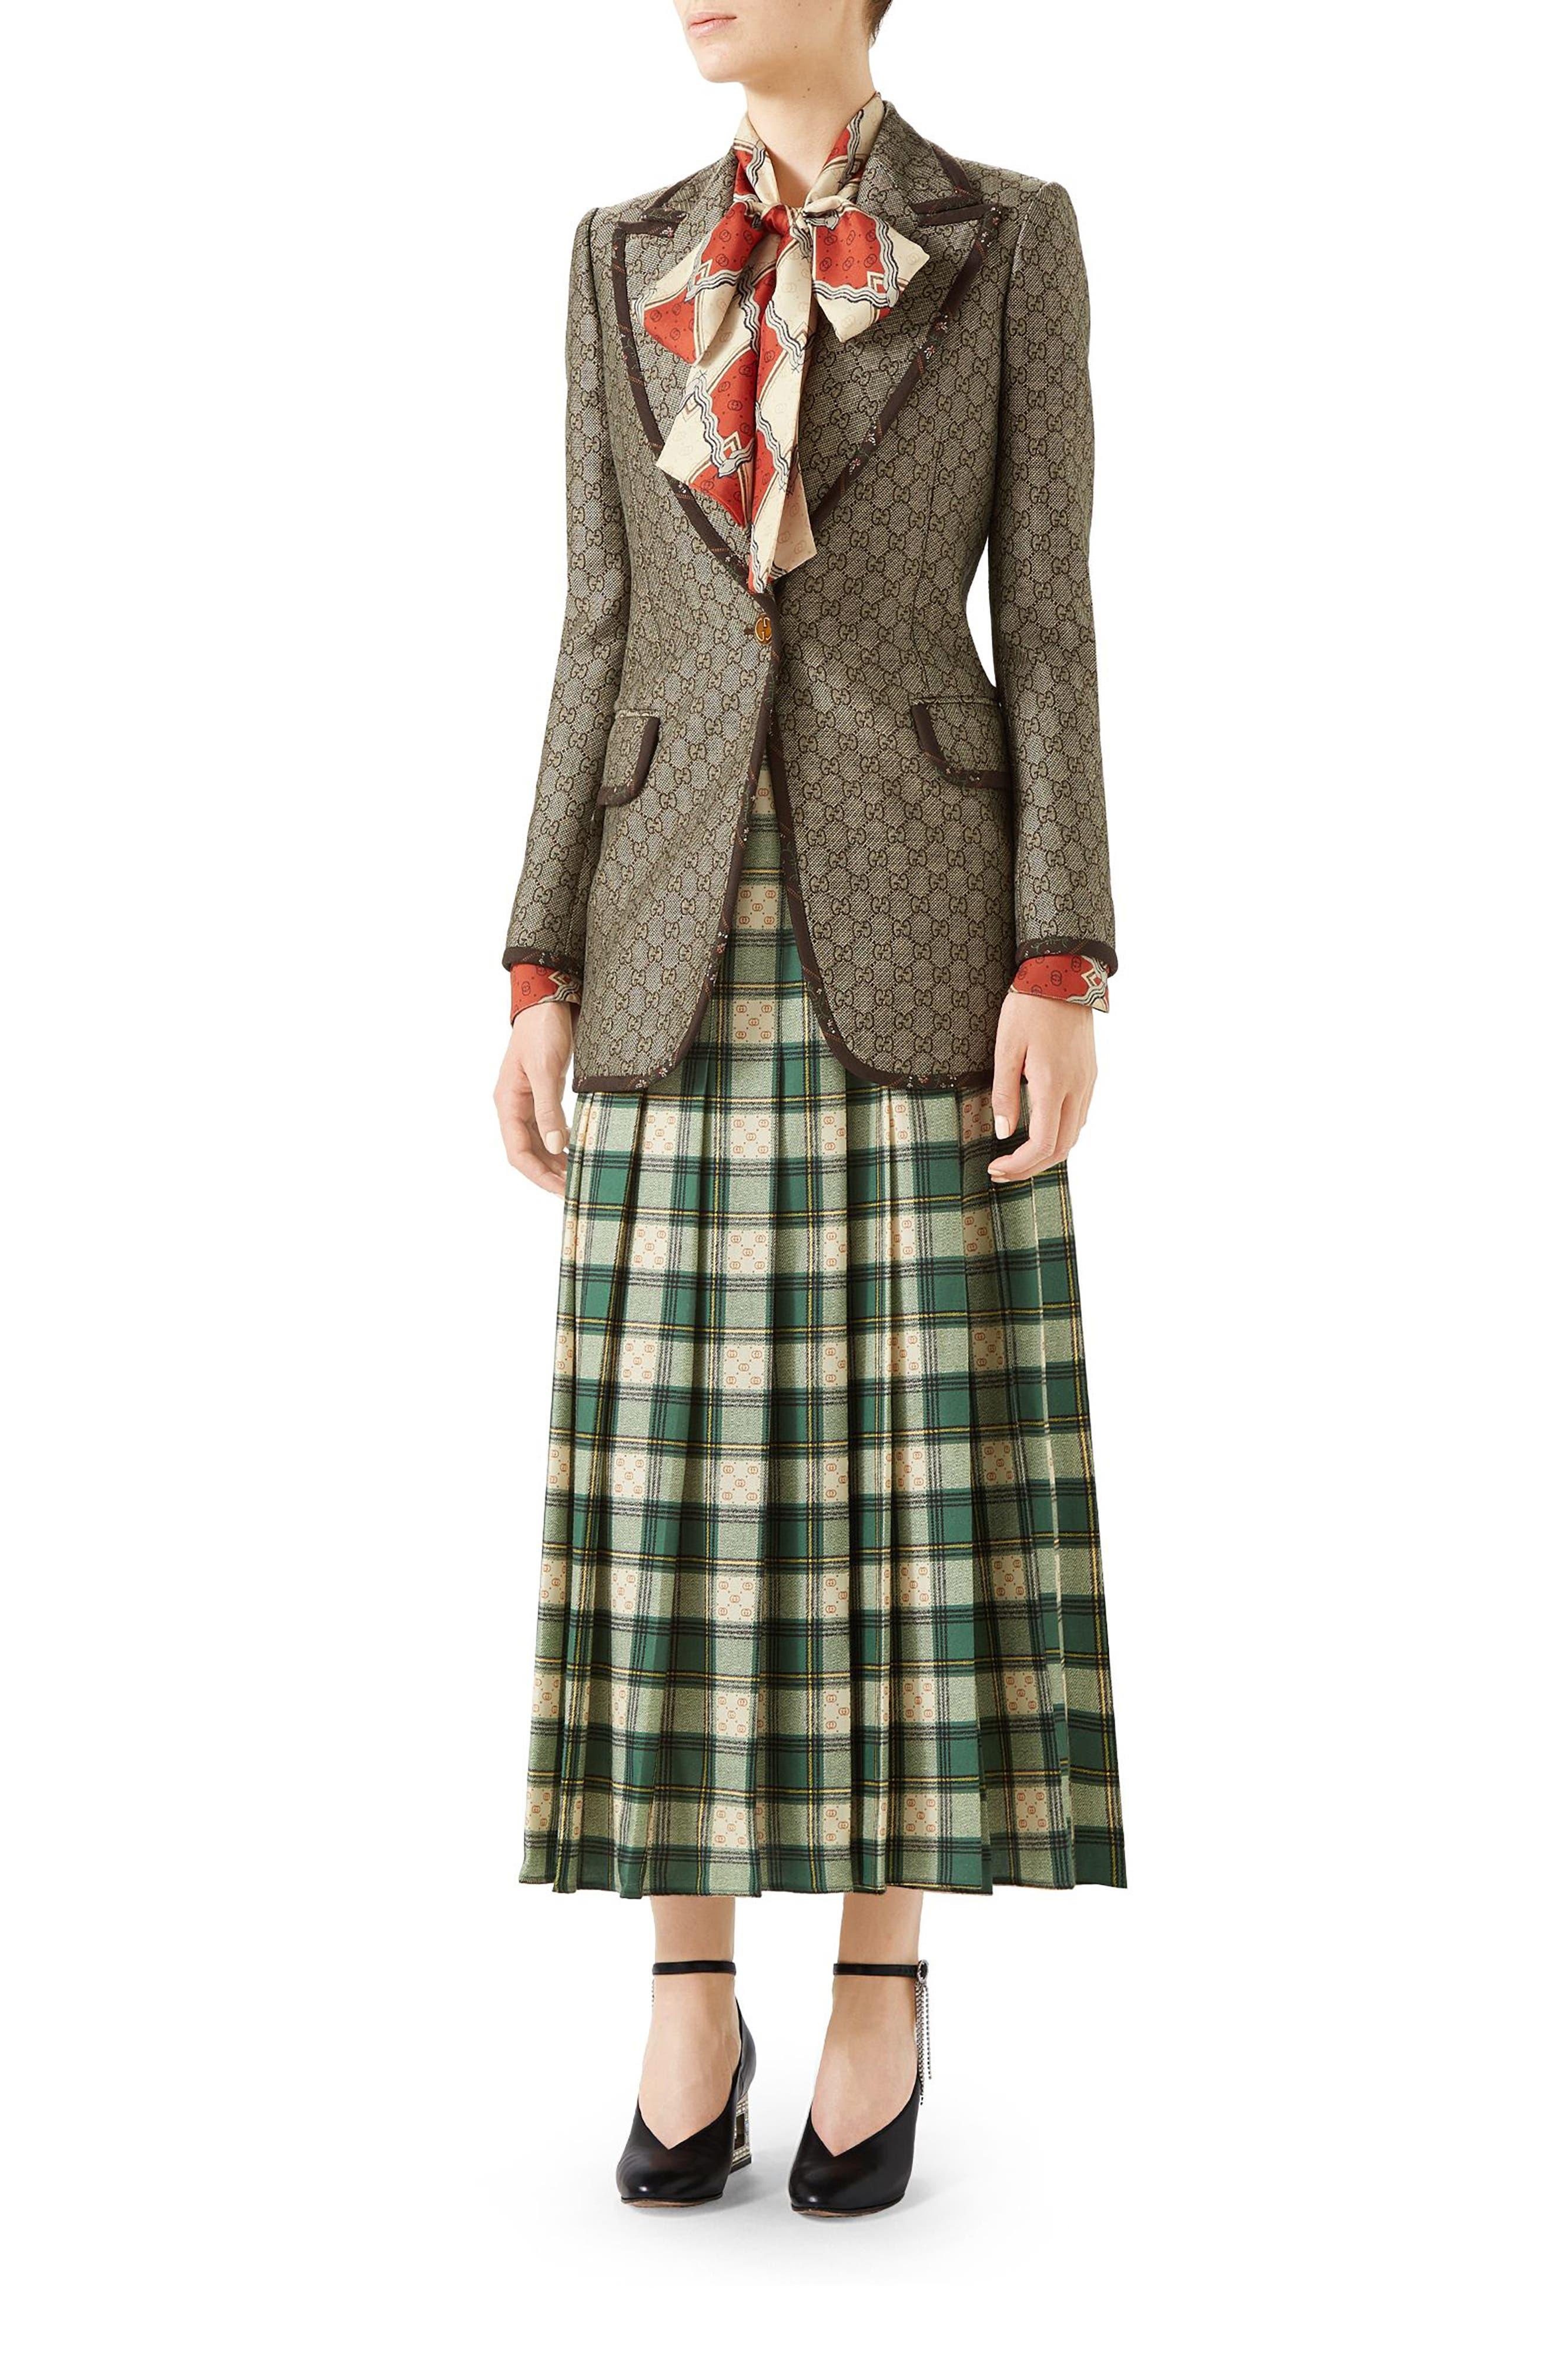 Tartan Check Wool Twill Maxi Skirt,                             Alternate thumbnail 4, color,                             3741 GREEN/ ROSE BEIGE PRI